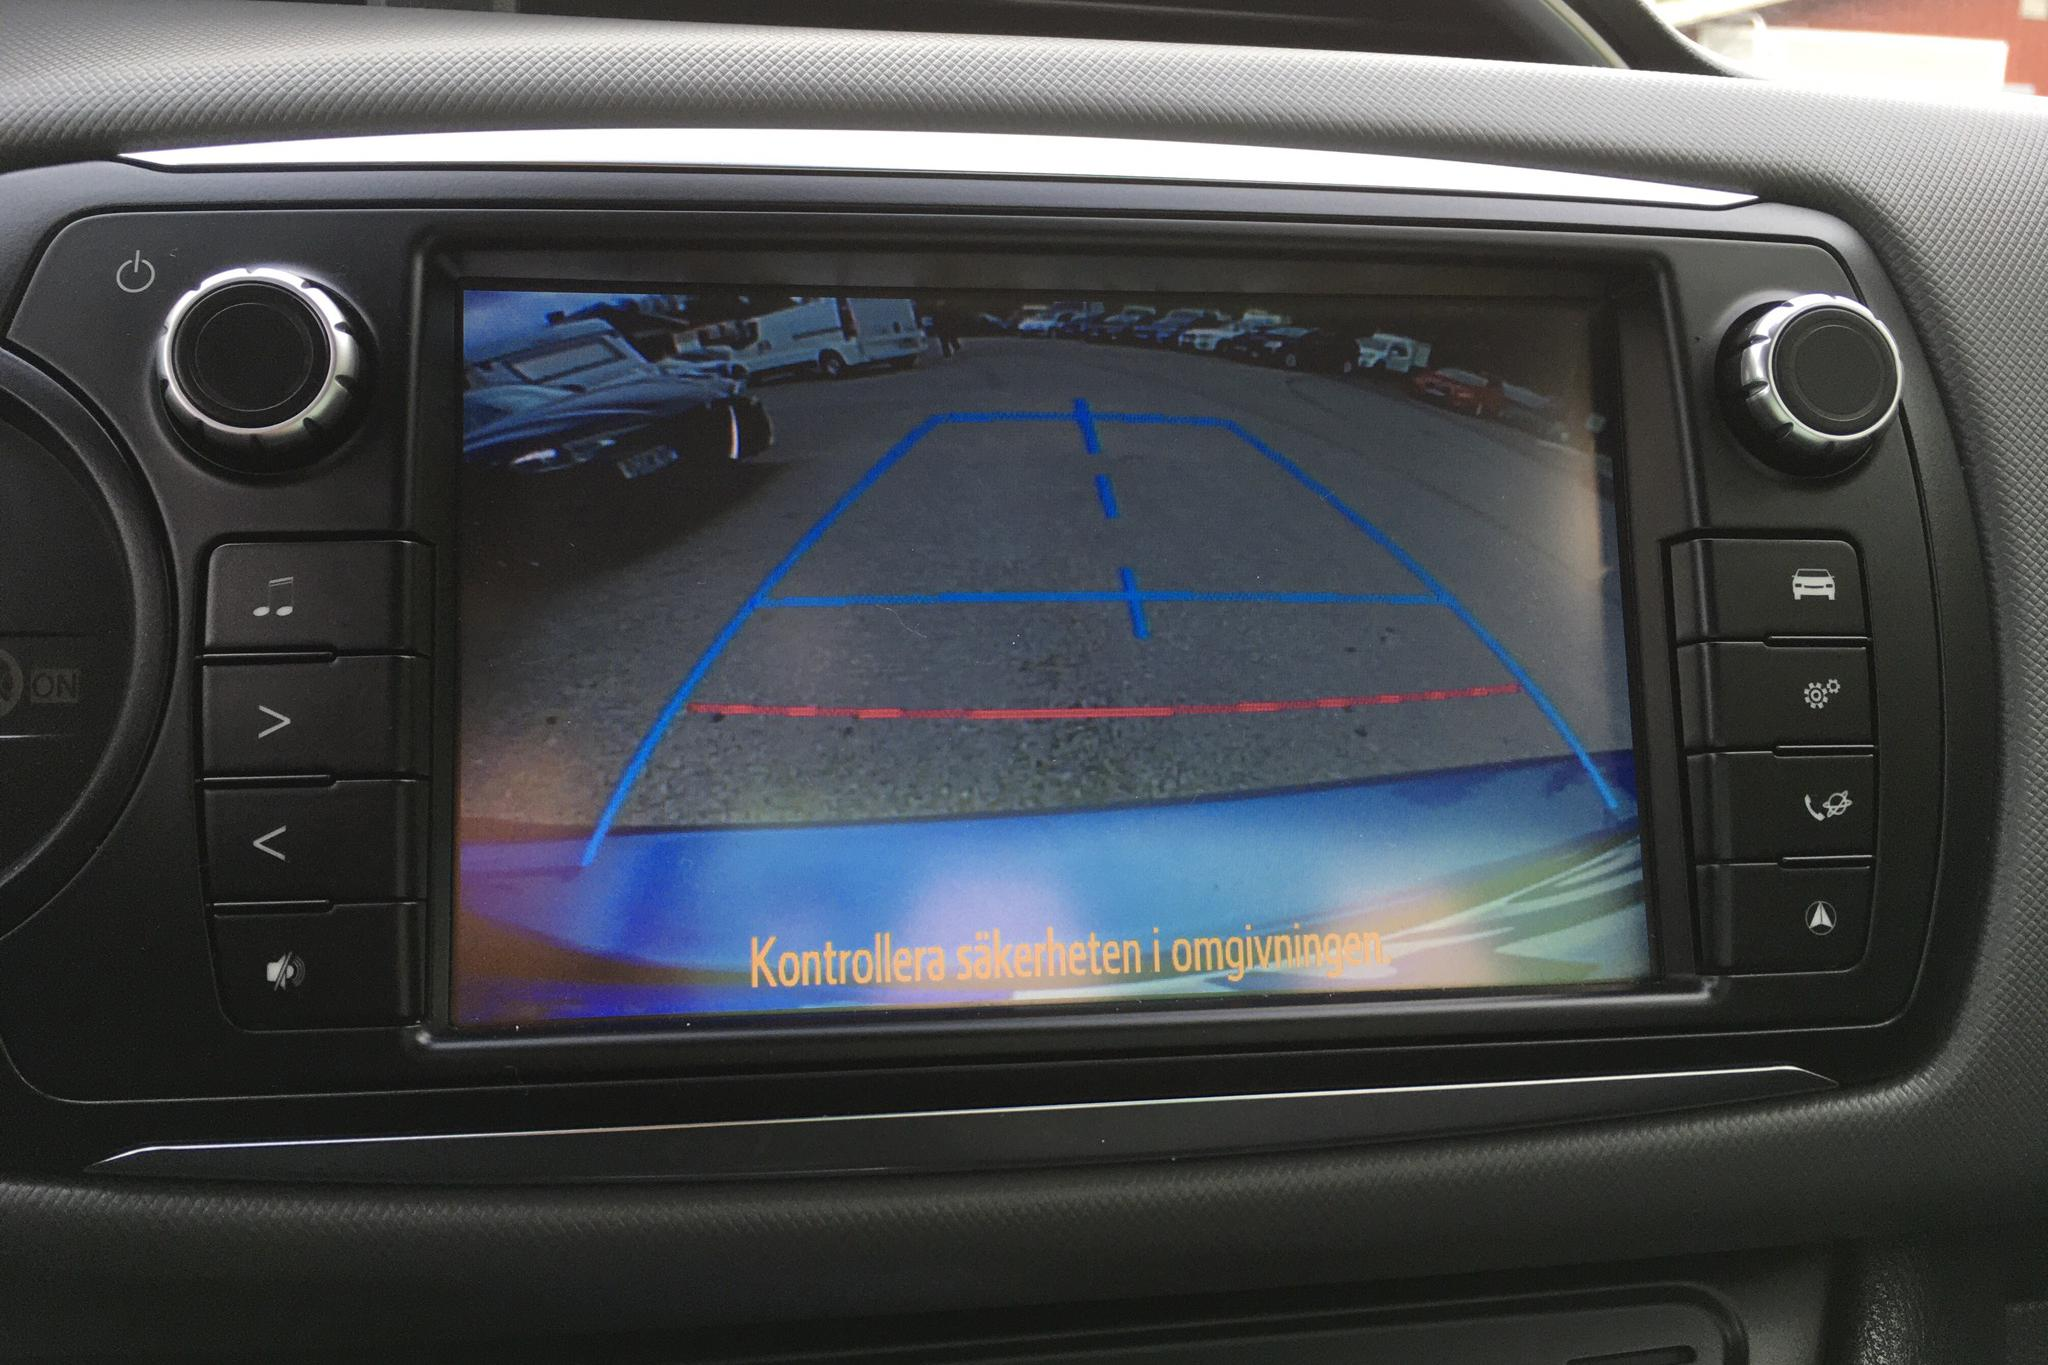 Toyota Yaris 1.5 HSD 5dr (75hk) - 4 901 mil - Automat - blå - 2016